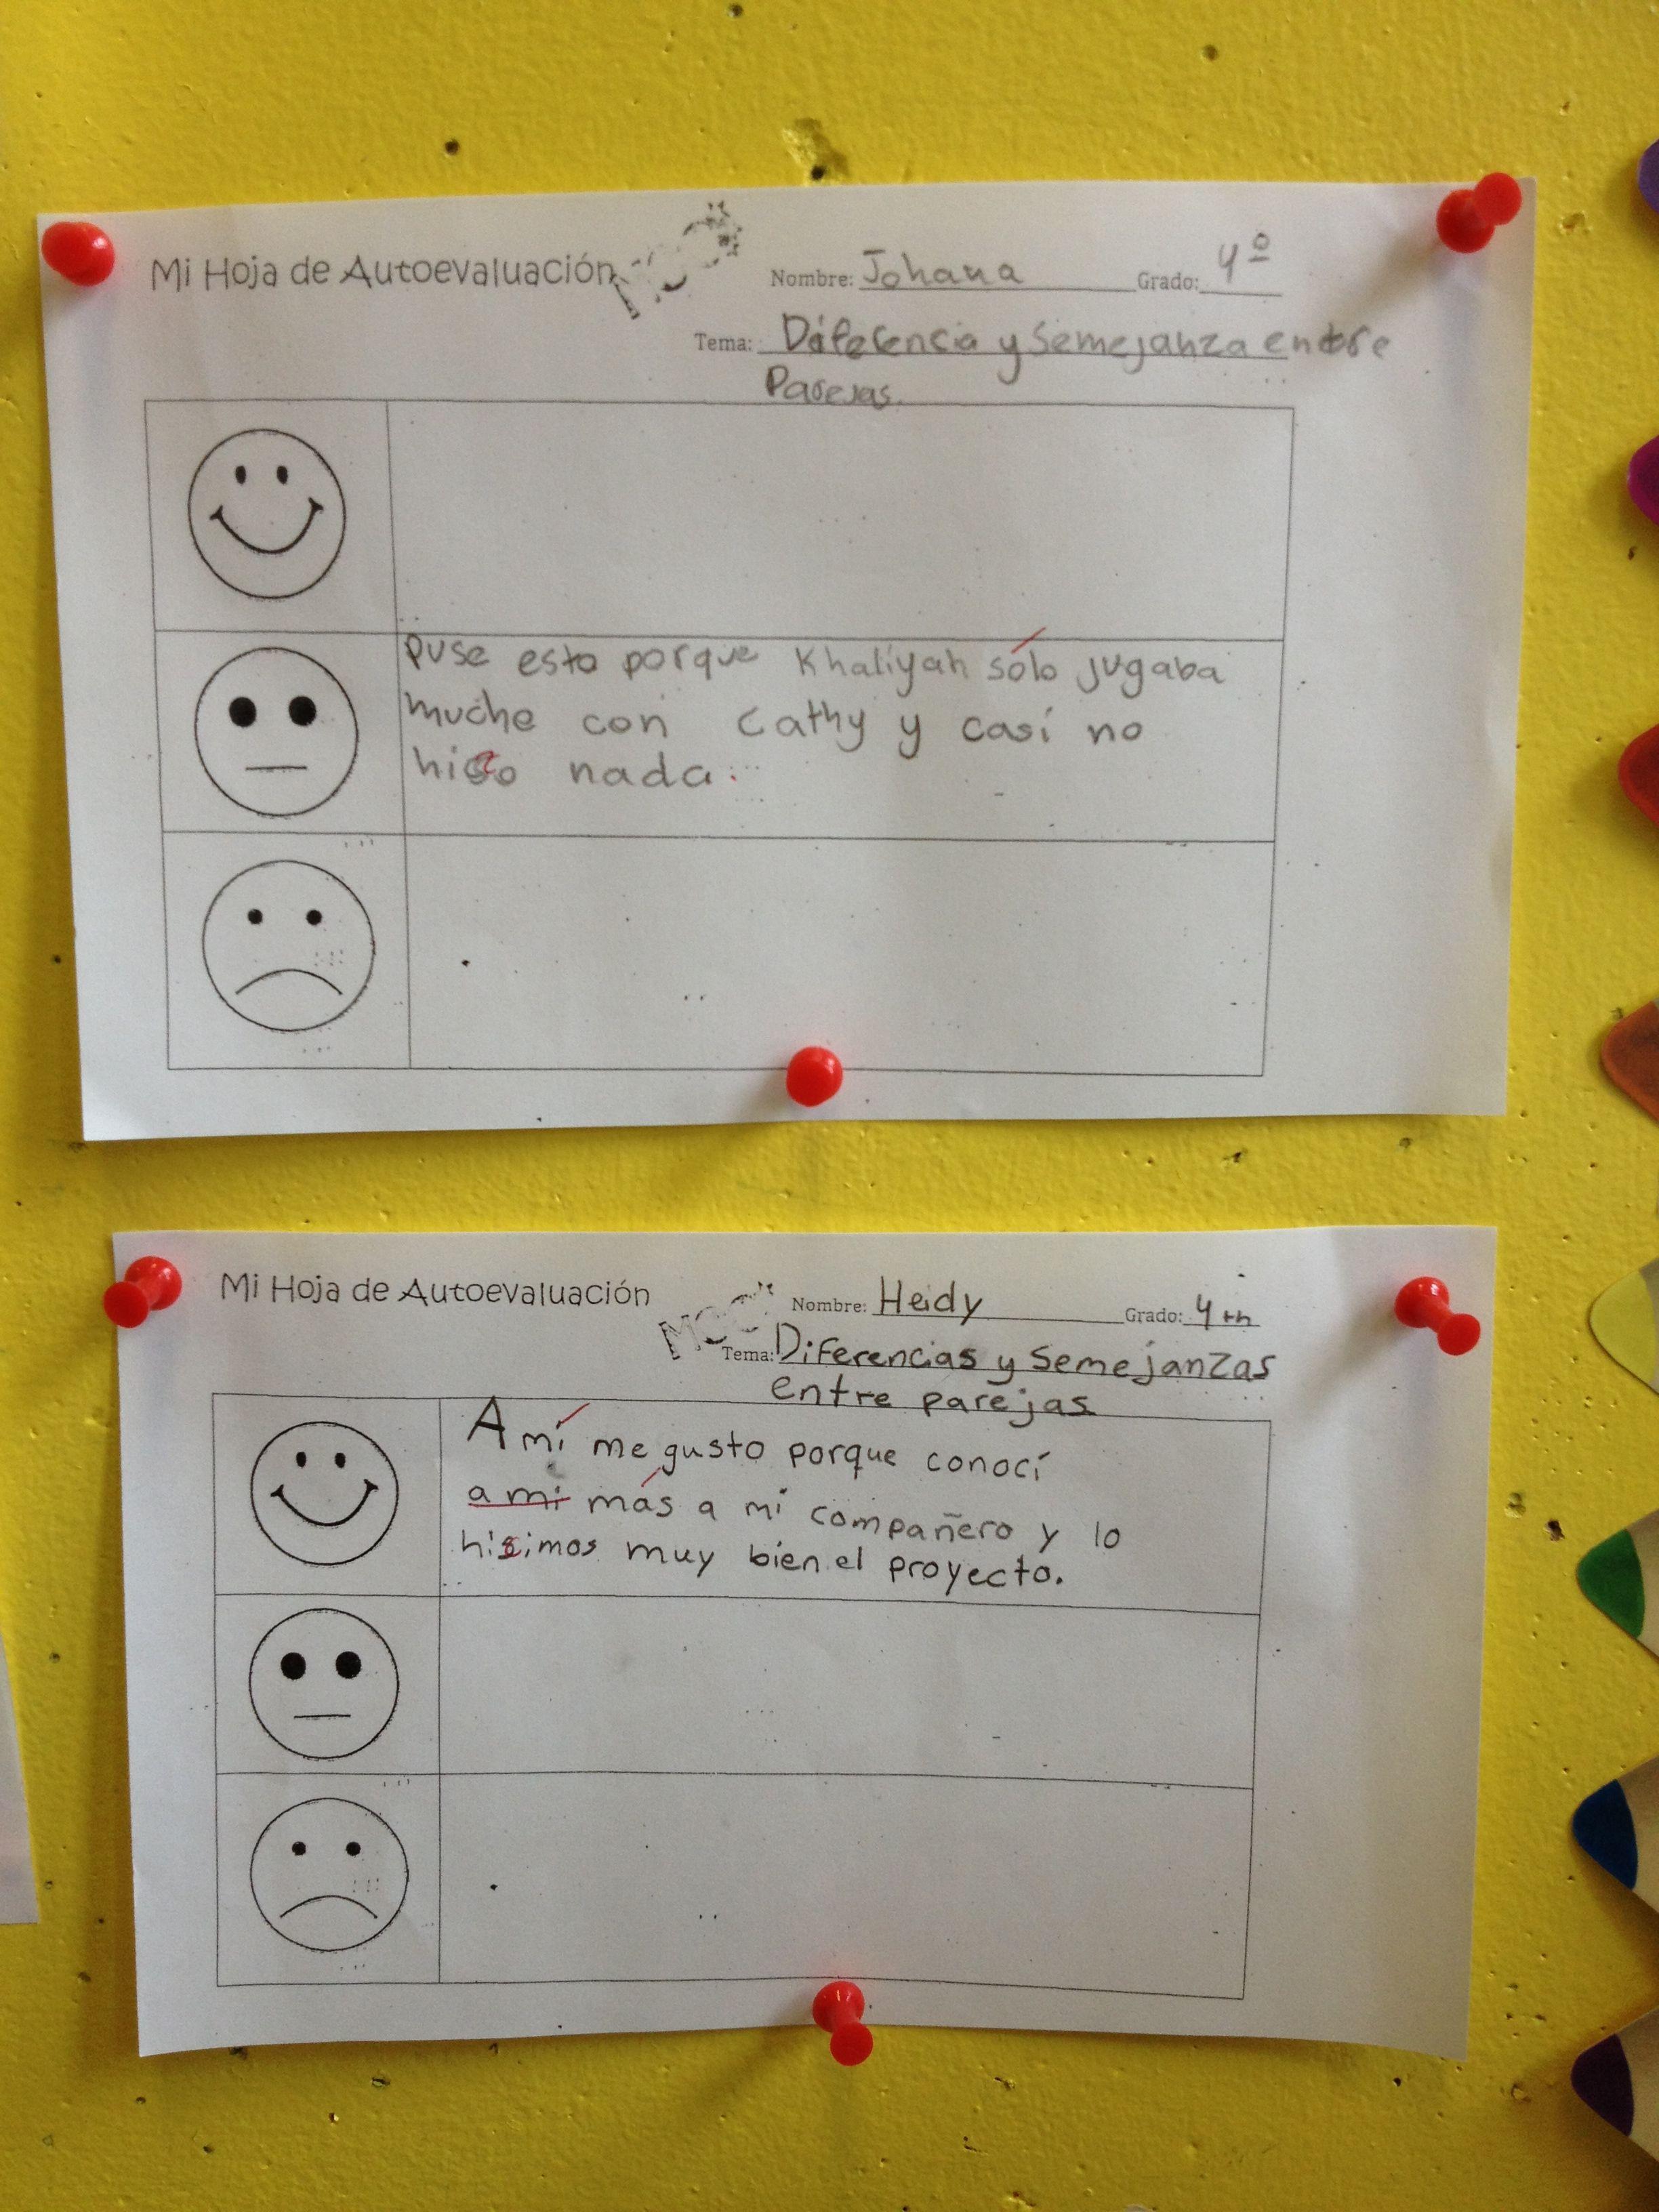 Student self assessment - 4th grade | Student self